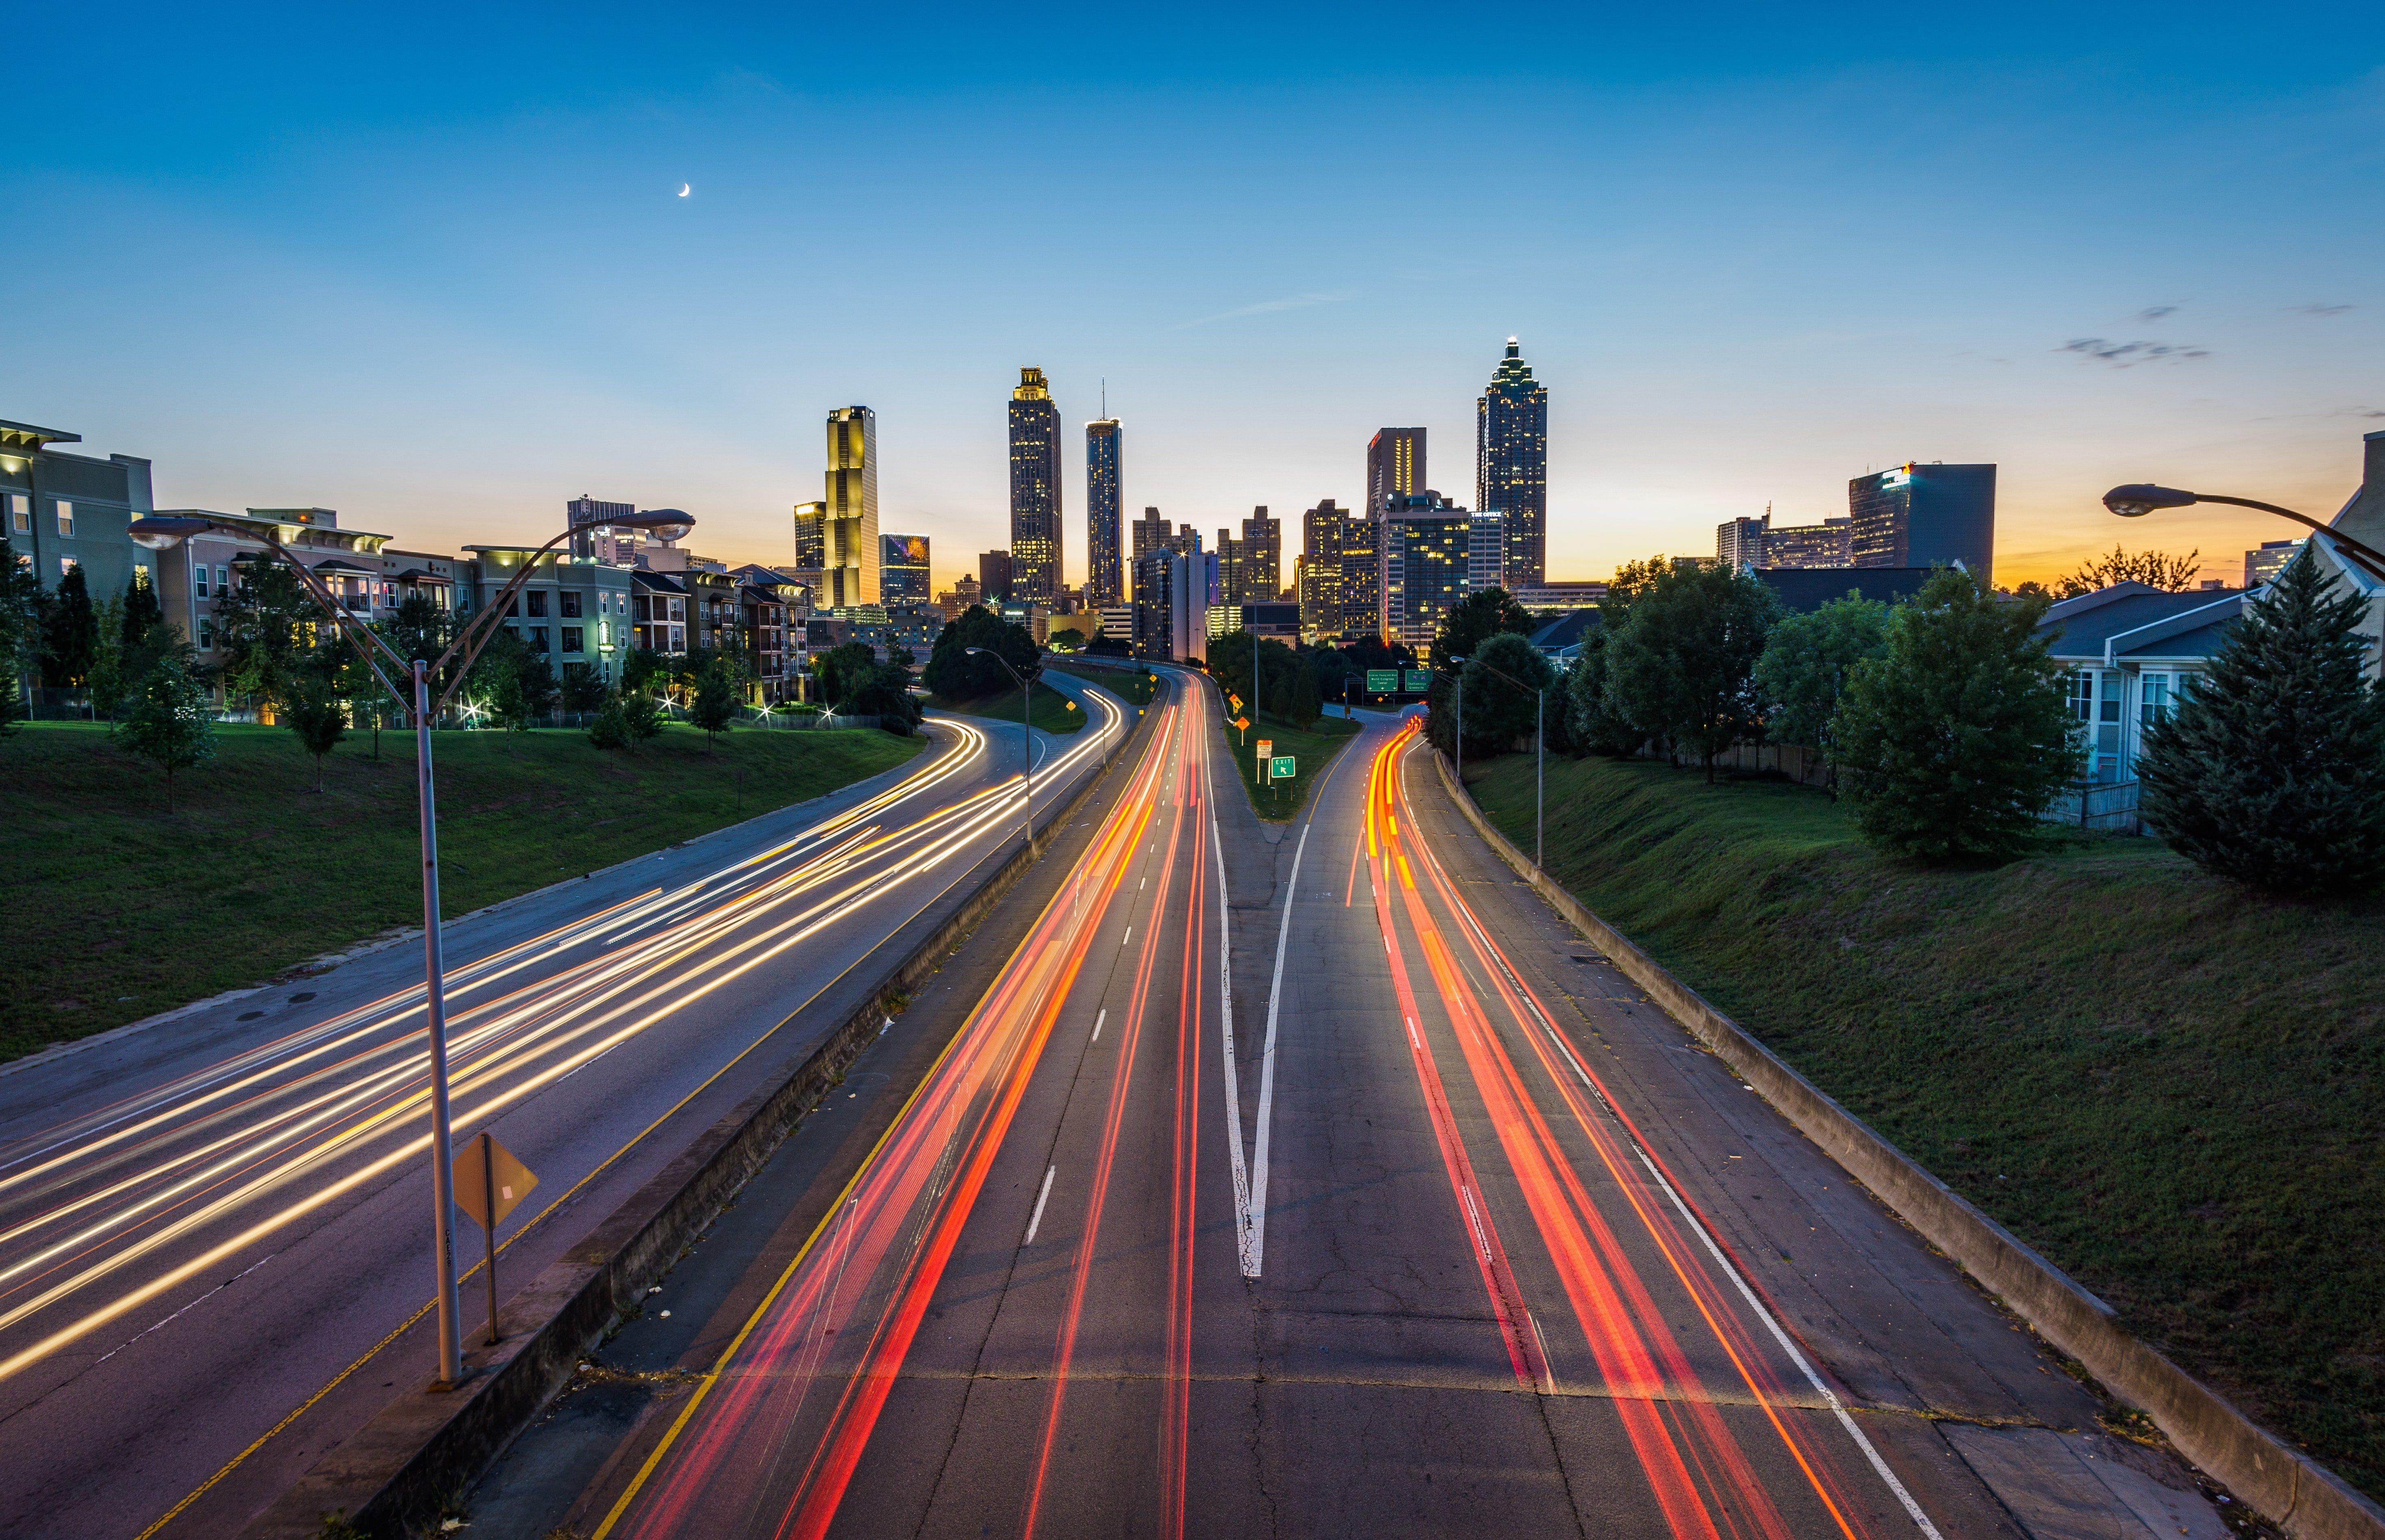 The Atlanta skyline at dusk.